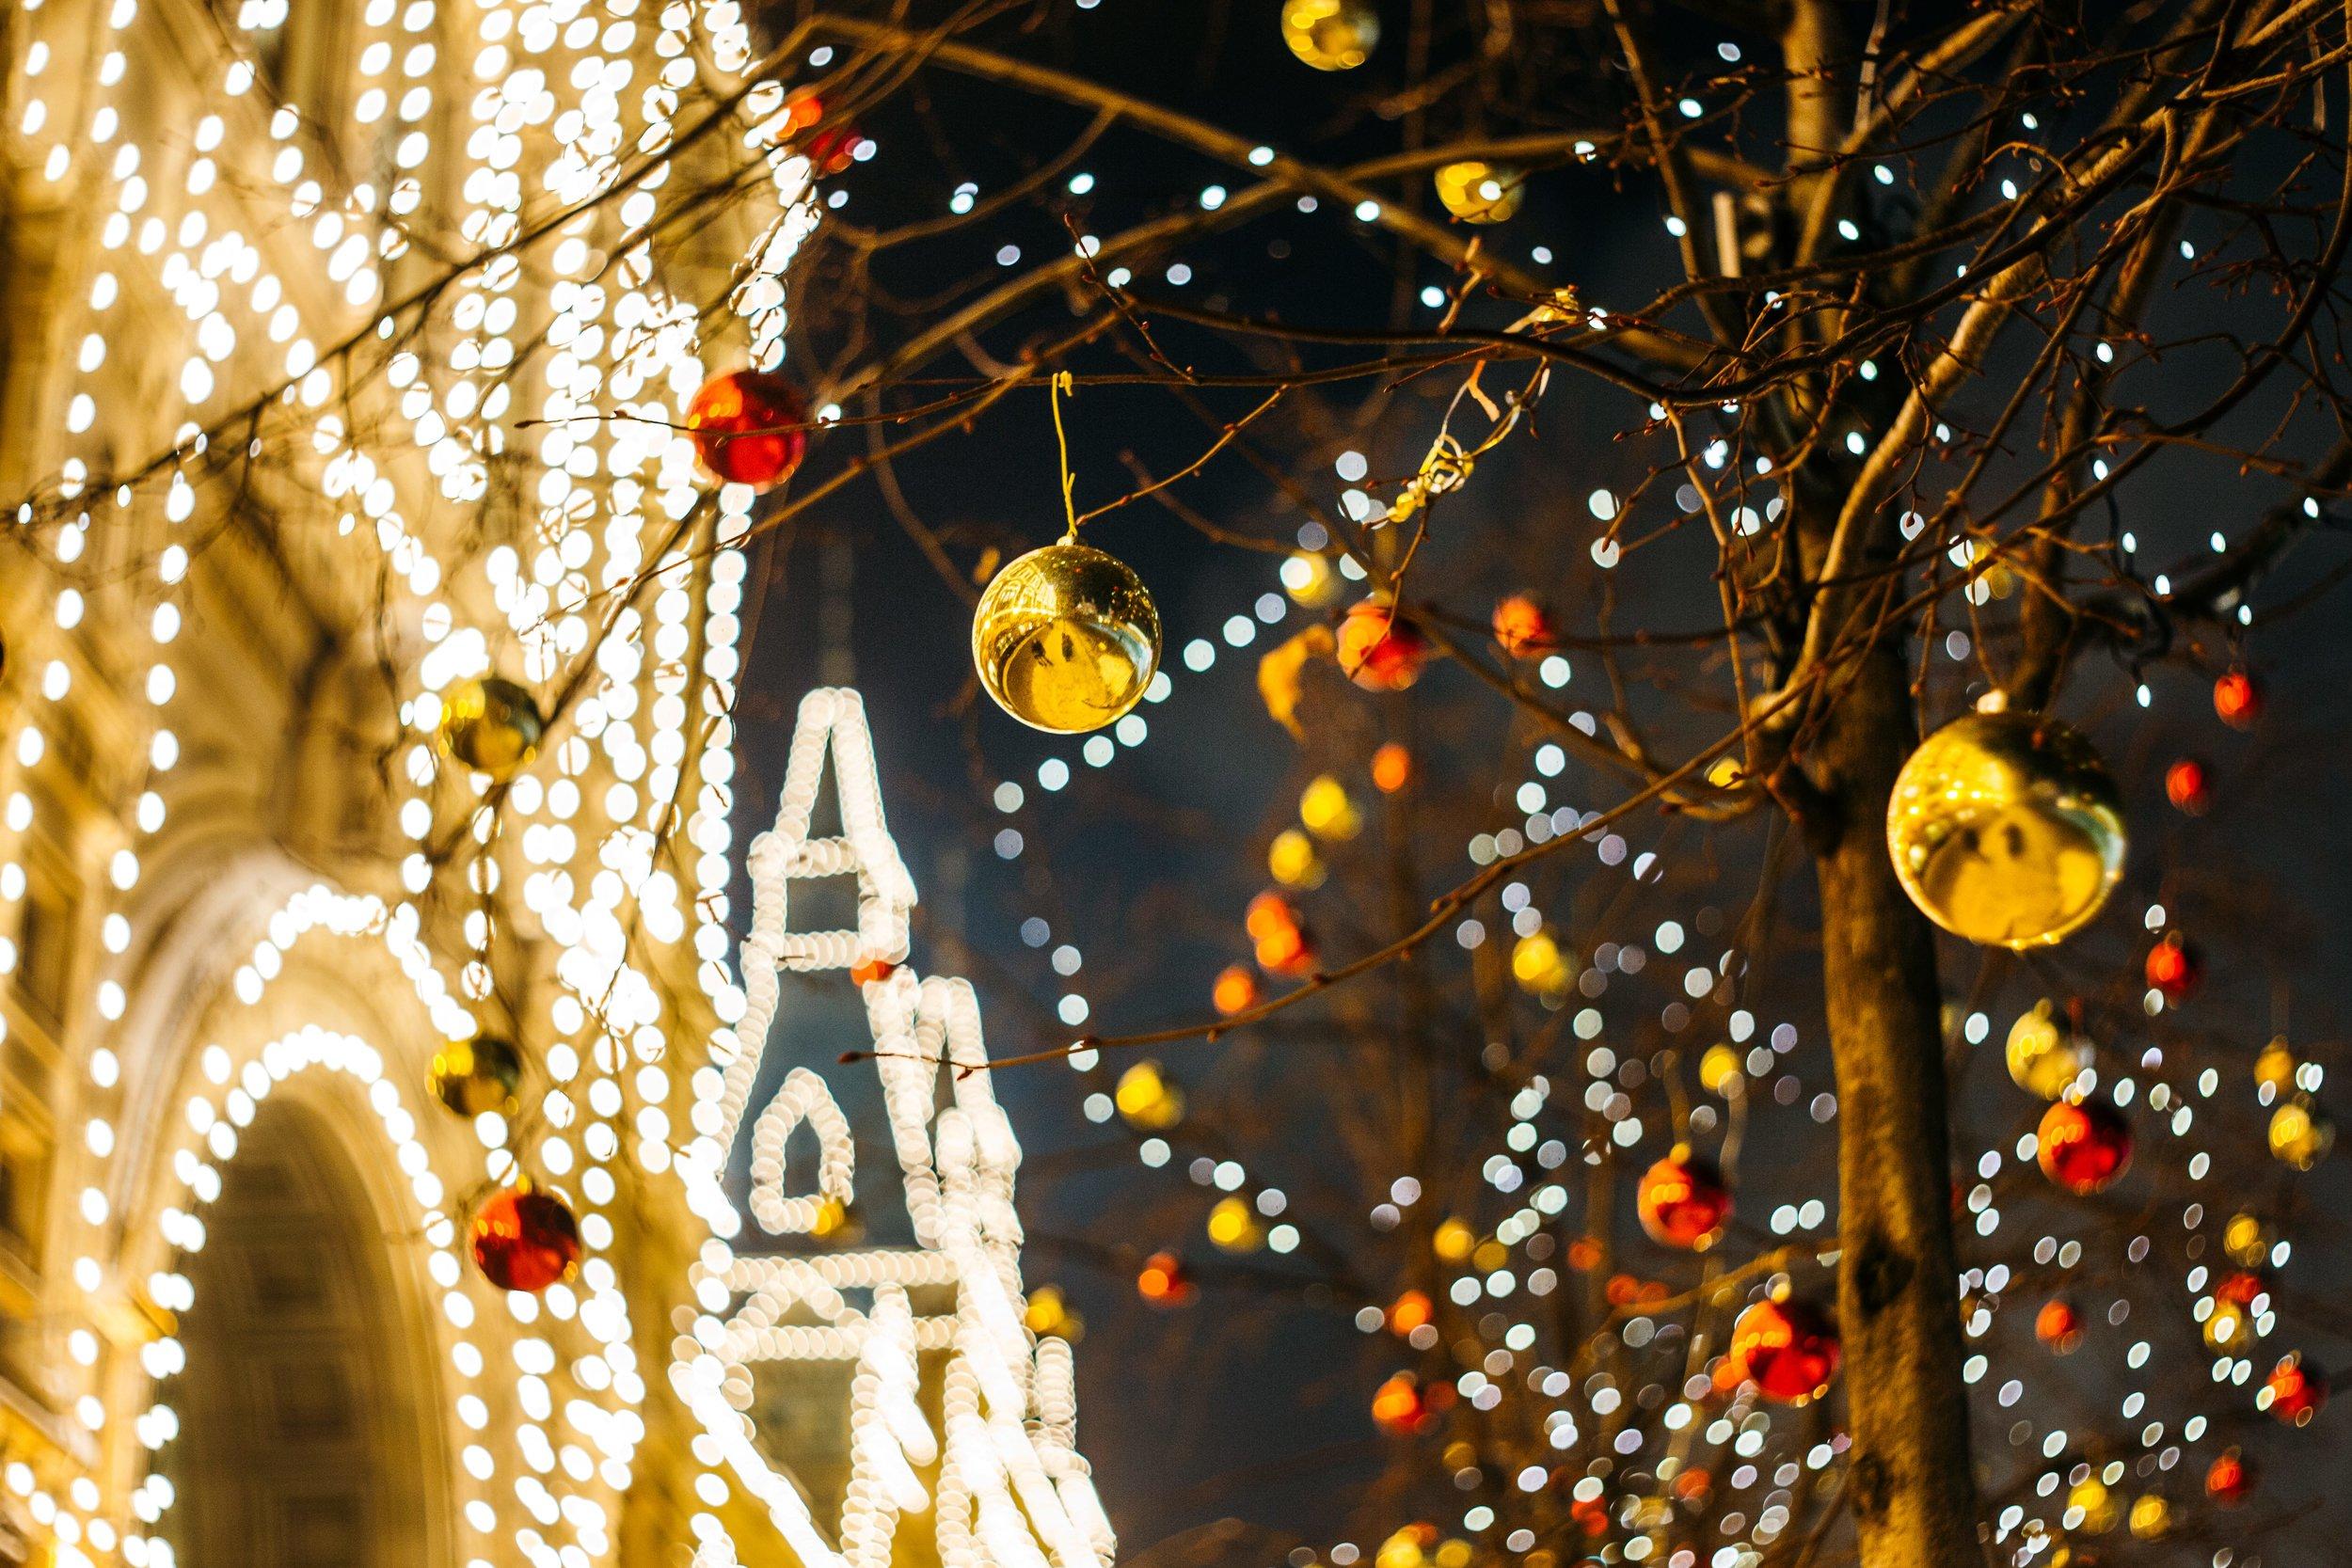 Christmas-music-outdoors.jpg